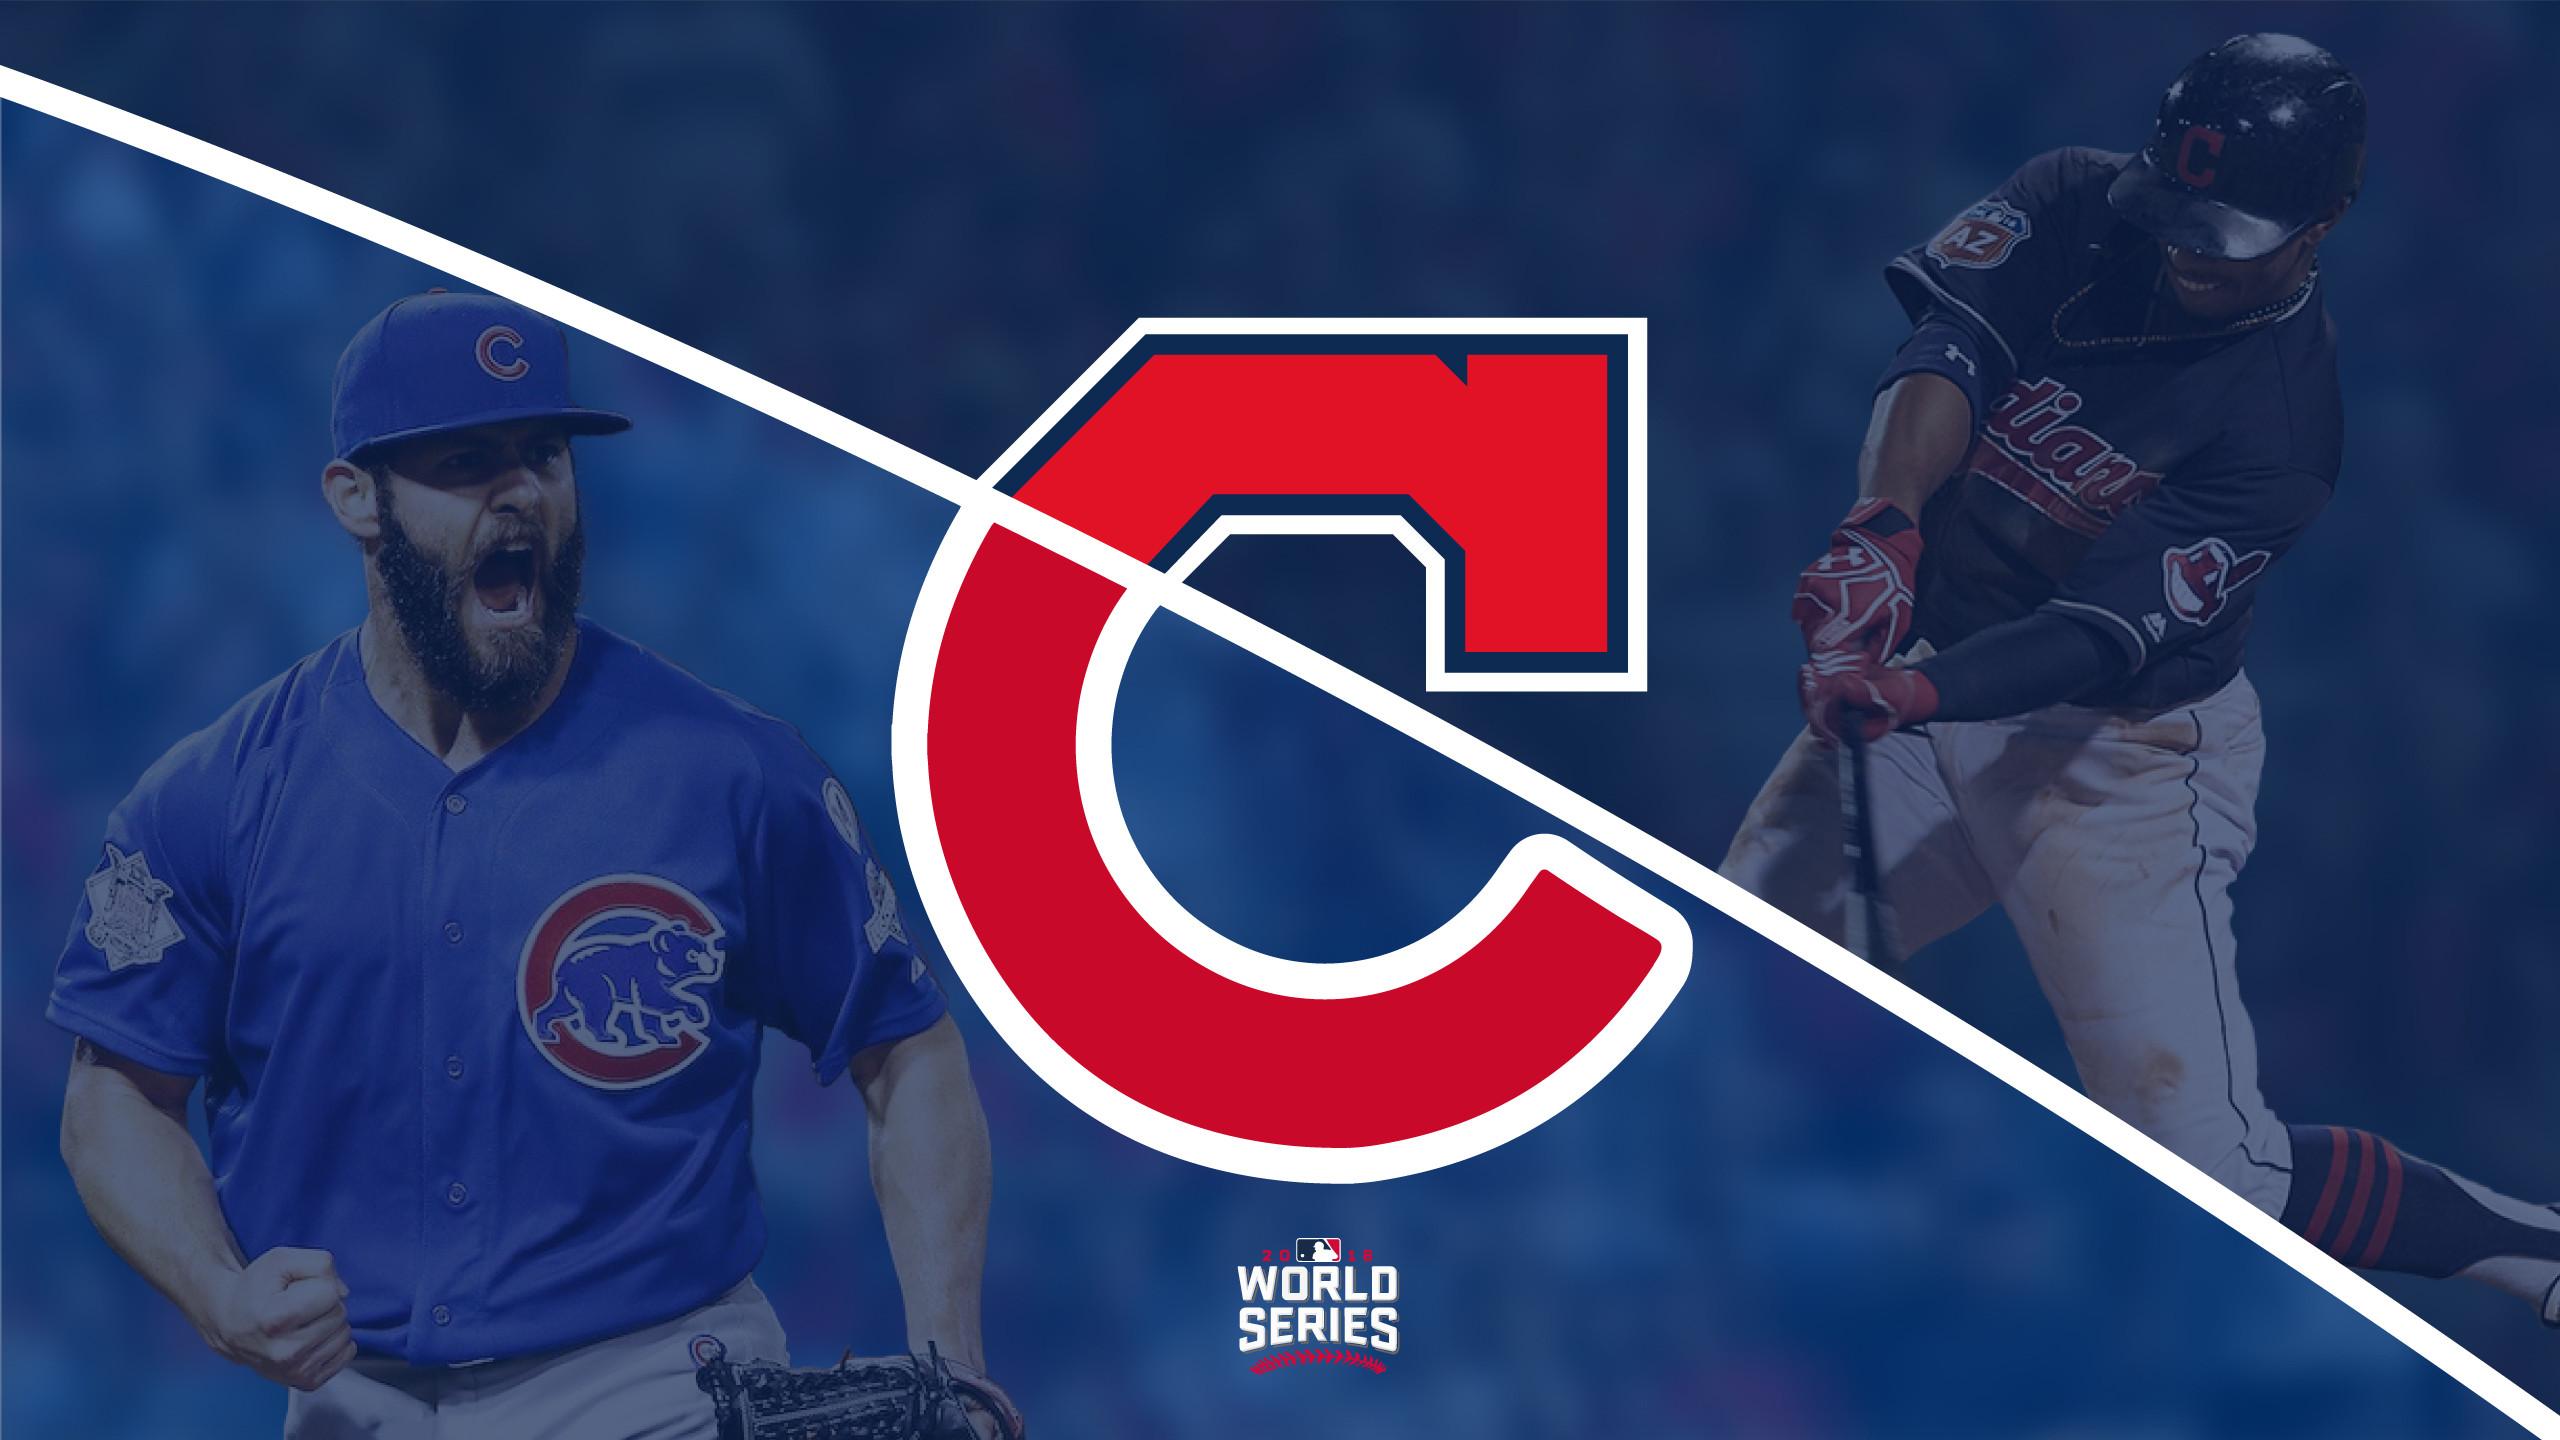 <b>Cleveland Indians Wallpaper</b> Screensaver – WallpaperSafari